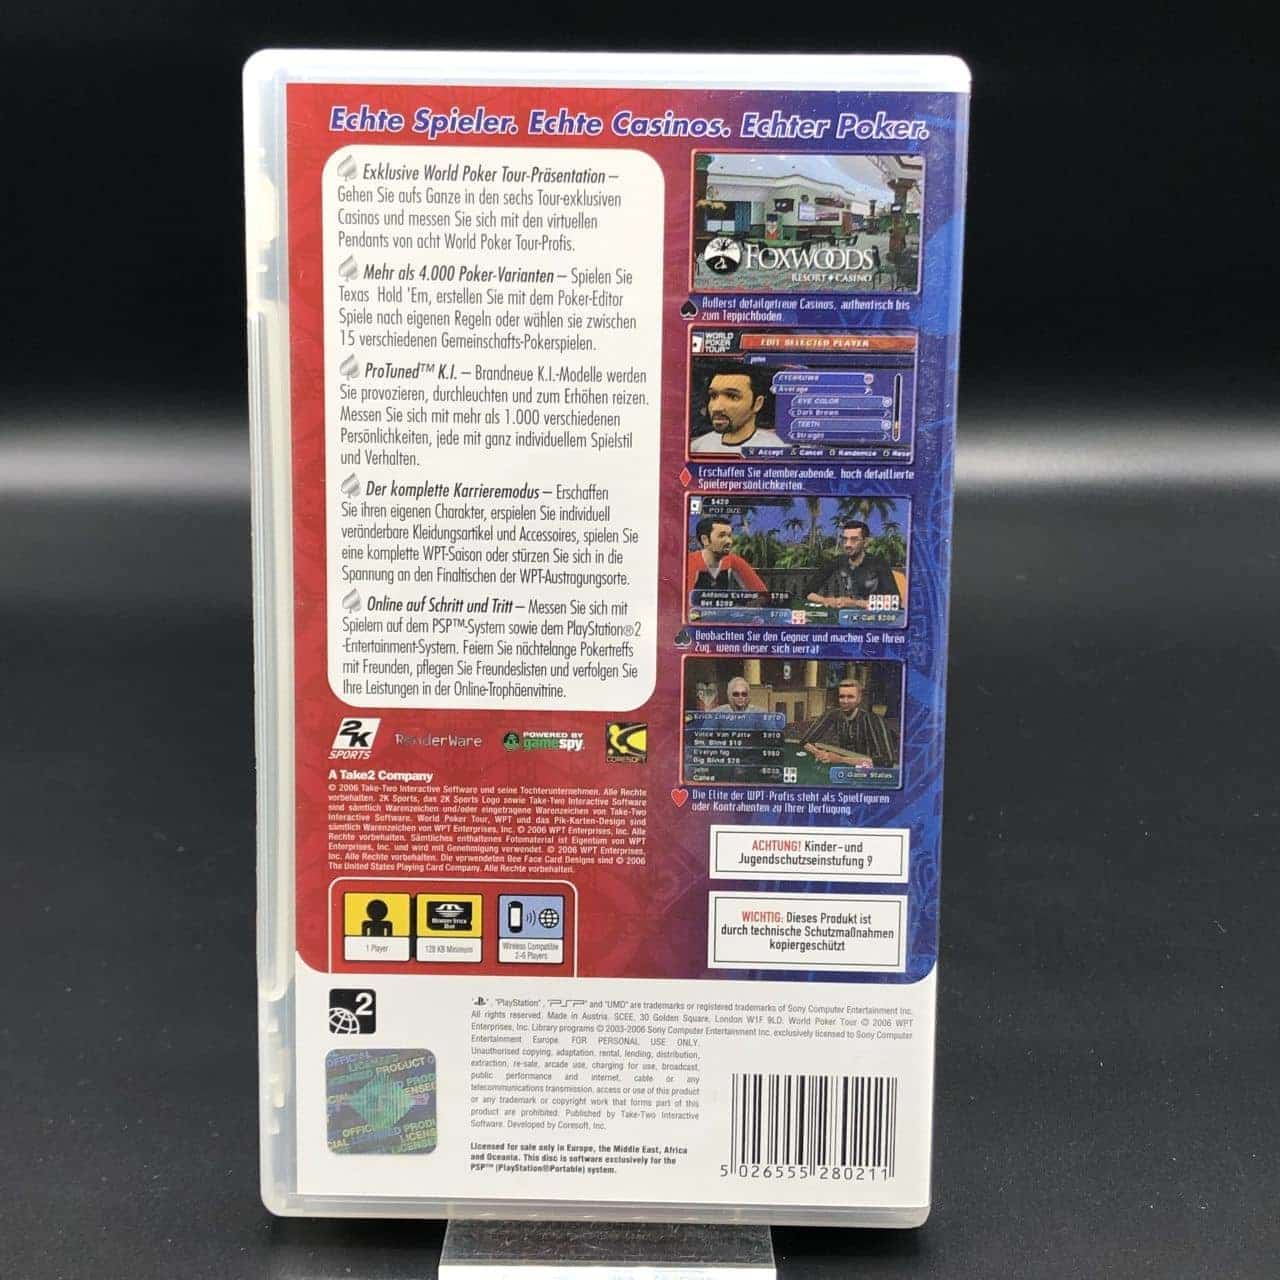 PSP World Poker Tour (Komplett) (Sehr gut) Sony PlayStation Portable